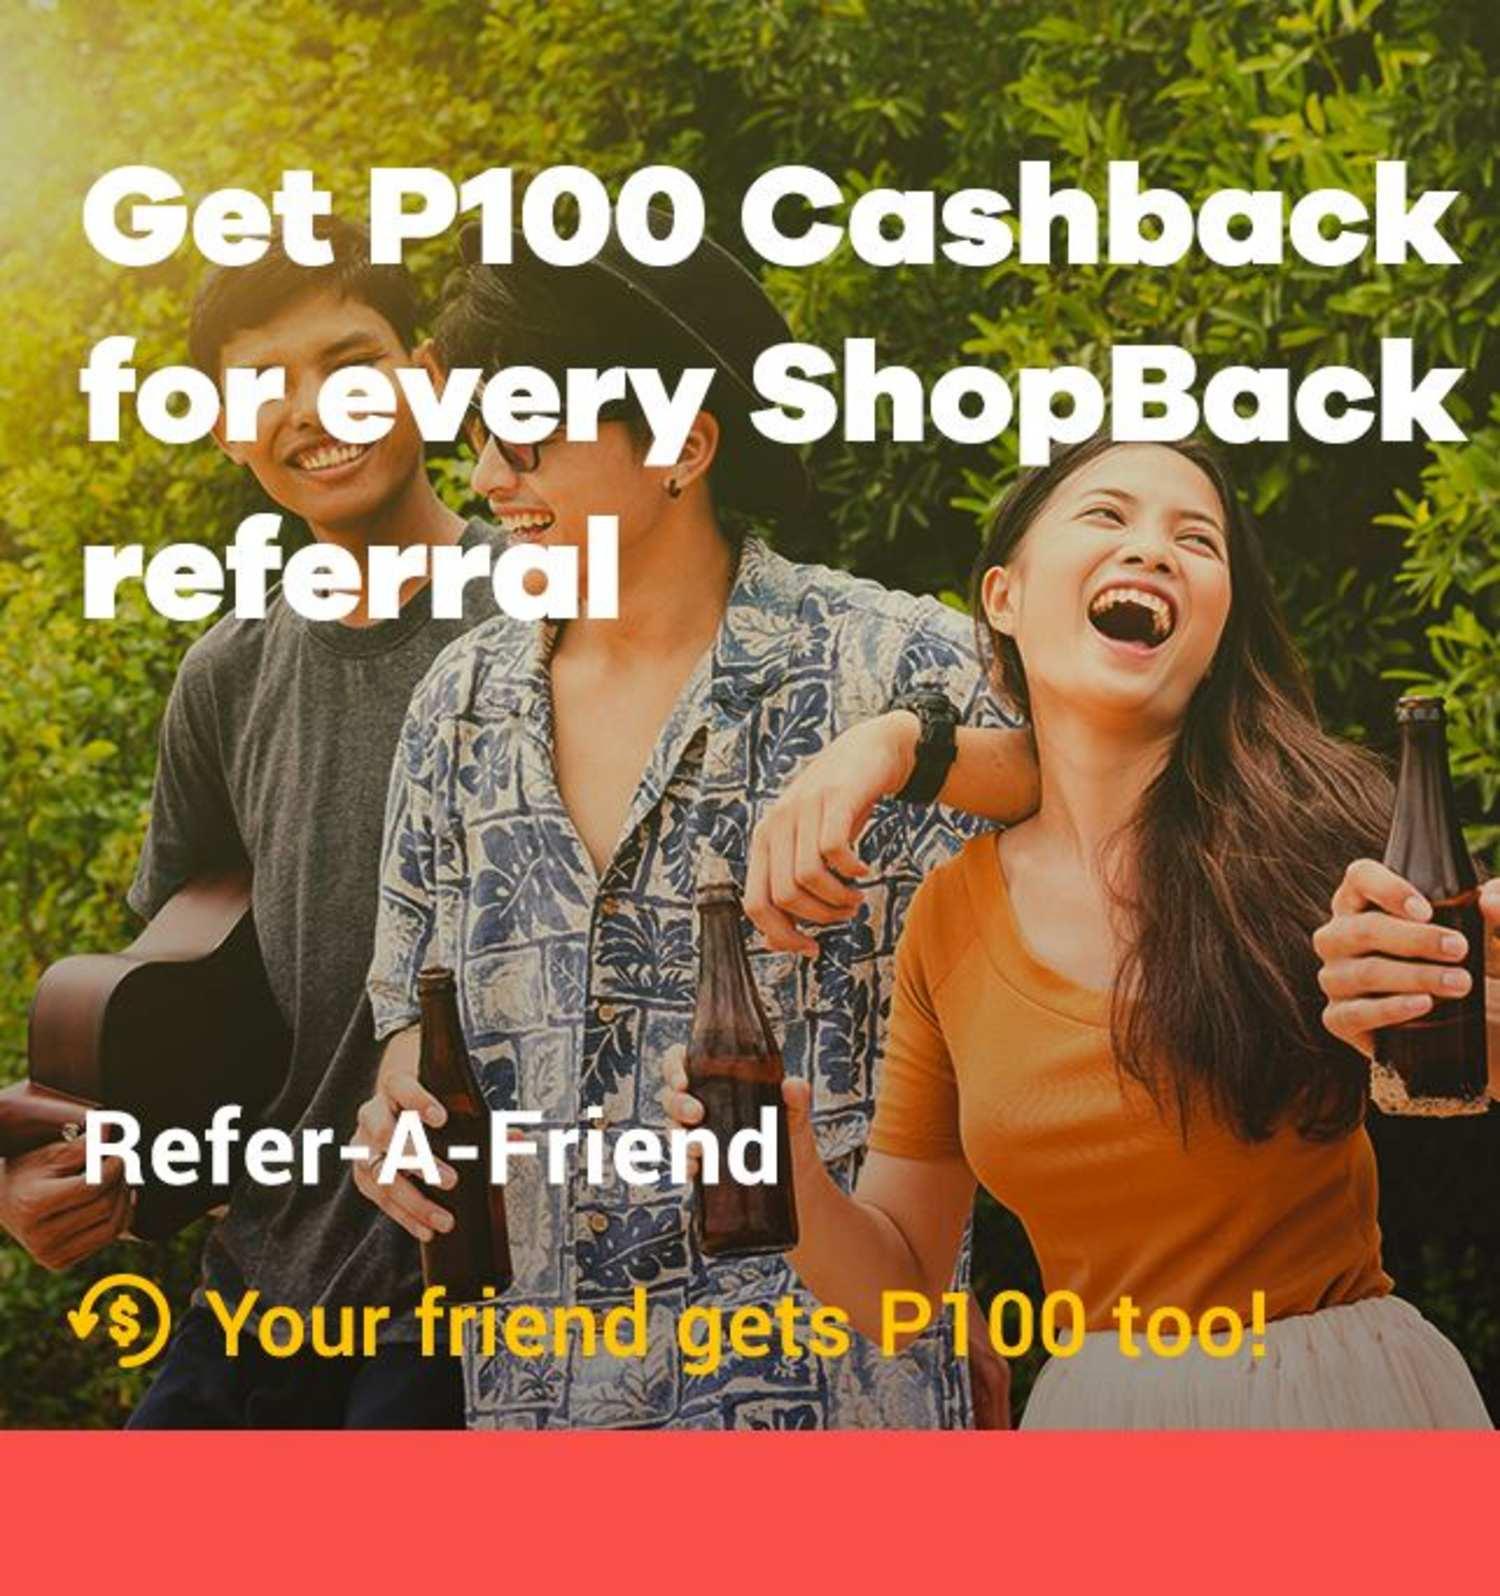 Refer a friend on ShopBack, Get P100 Cashback bonus